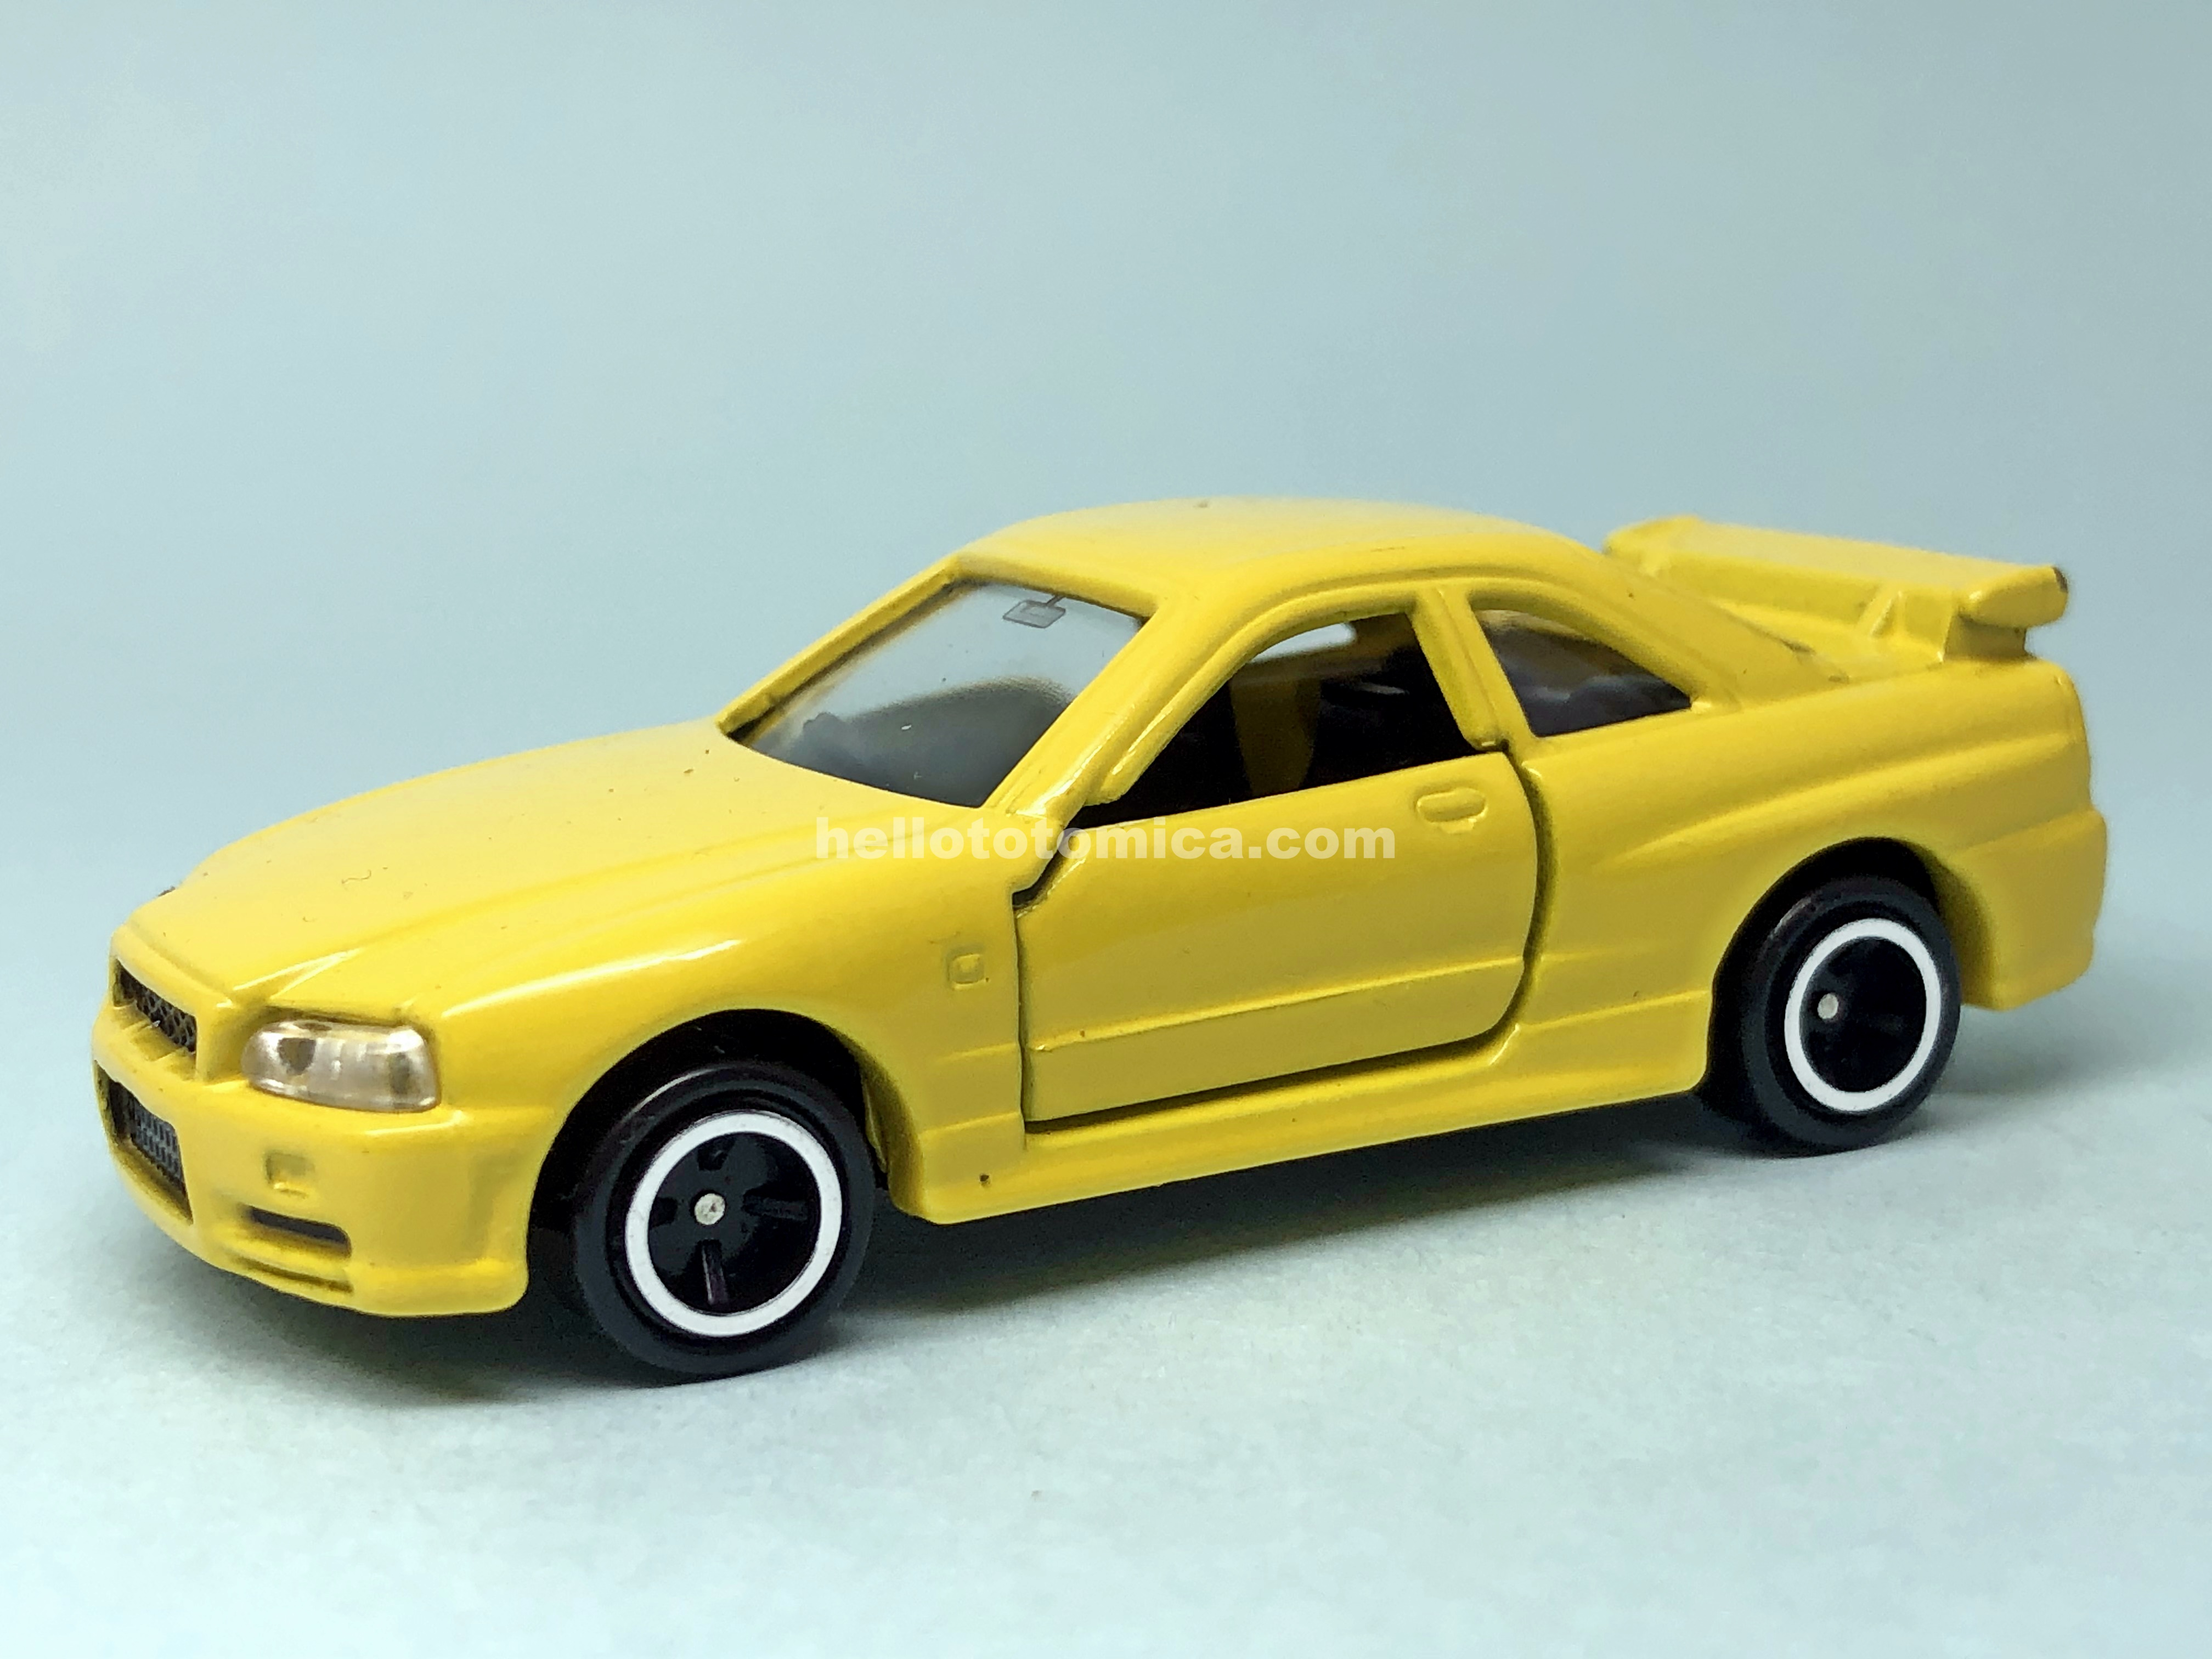 20-8 SKYLINE GT-R R34 Roadcar